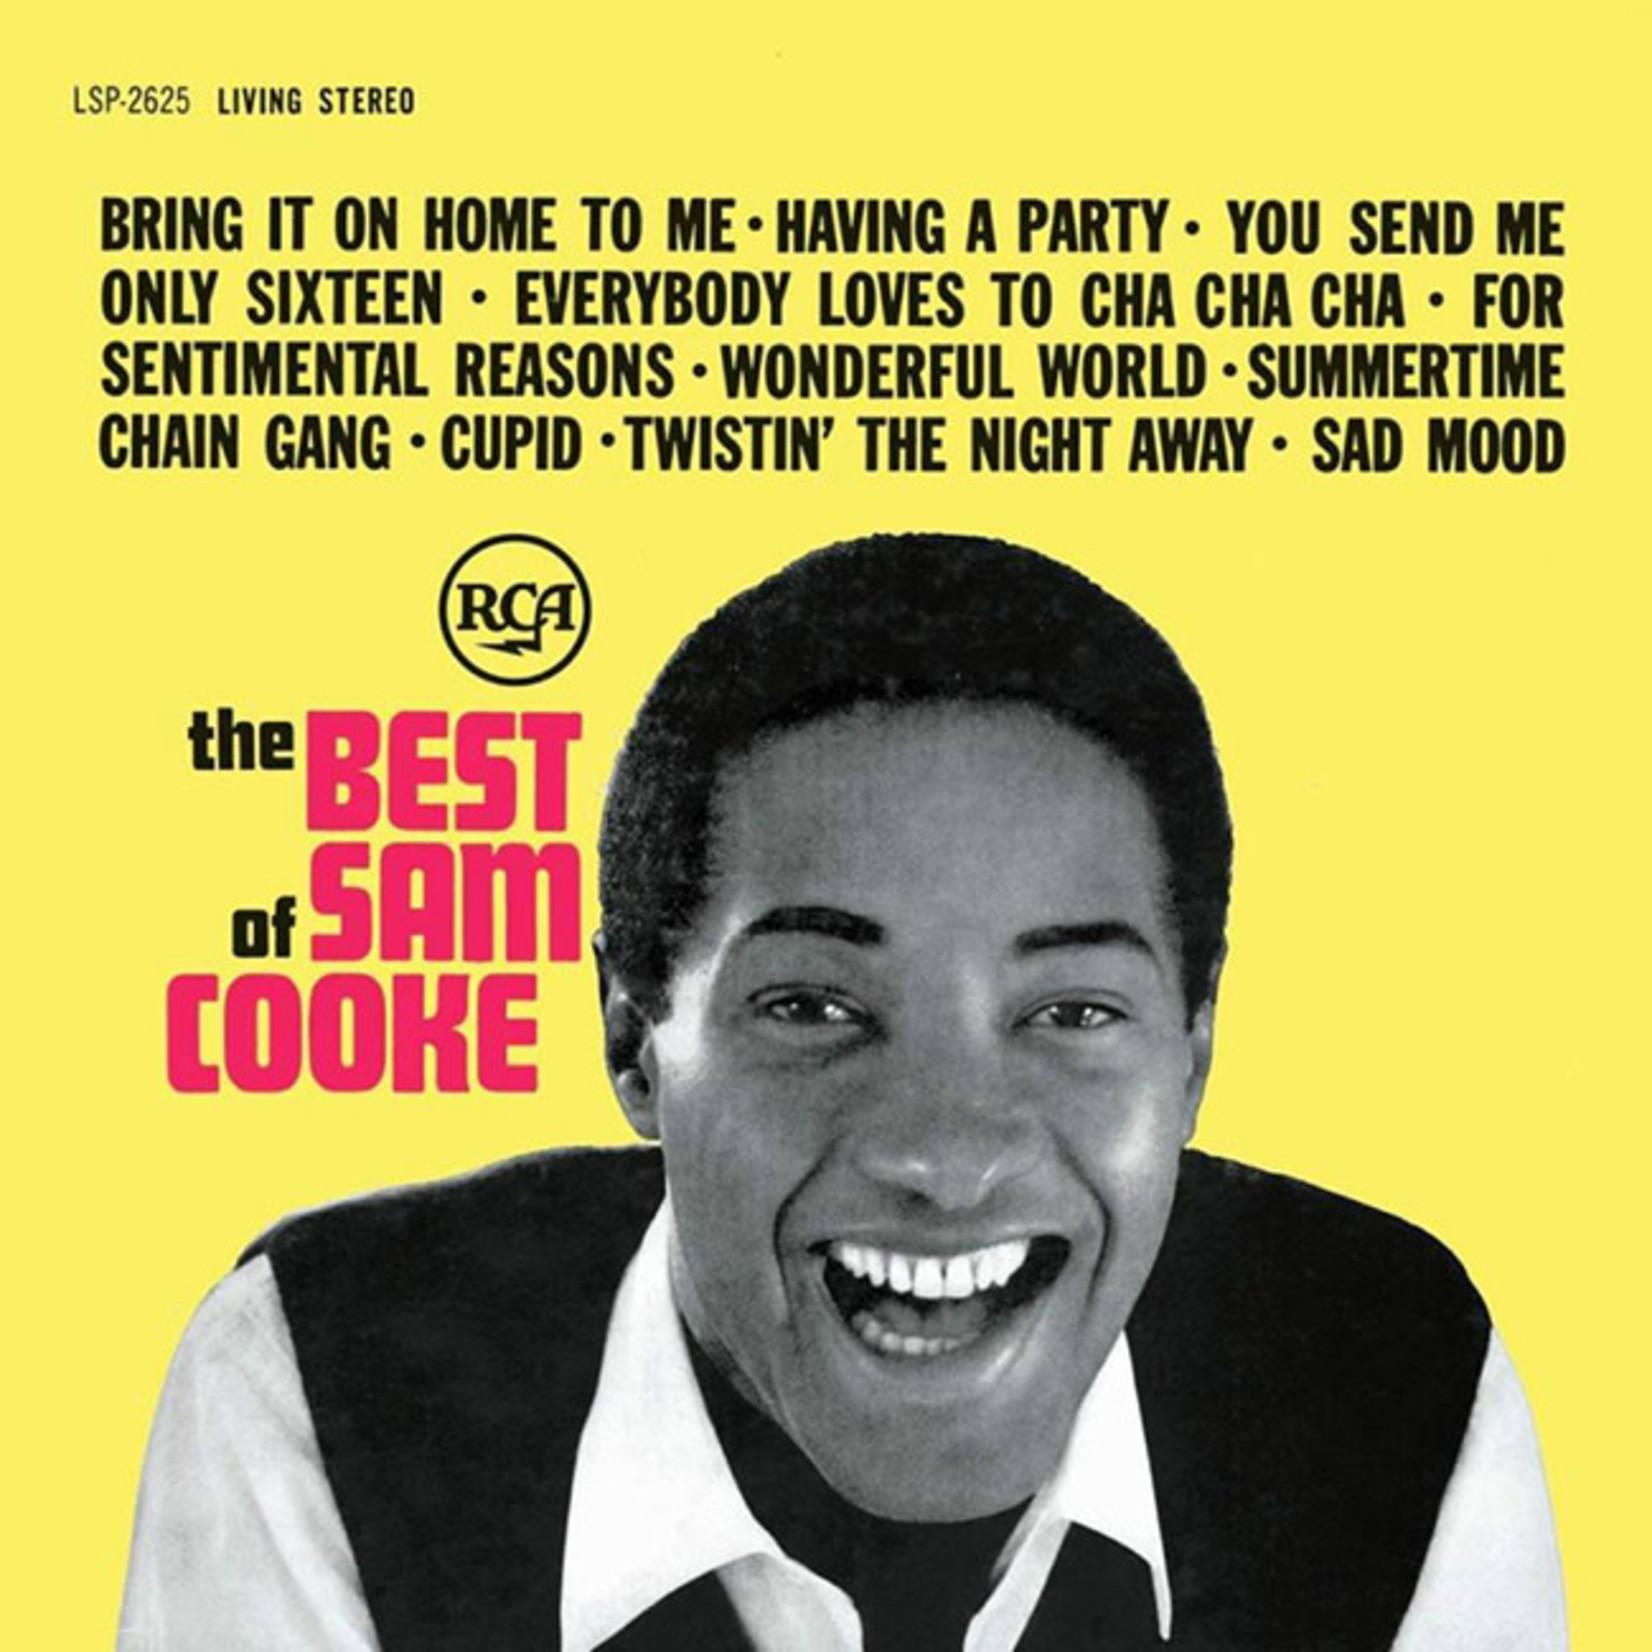 [New] Cooke, Sam: The Best Of Sam Cooke